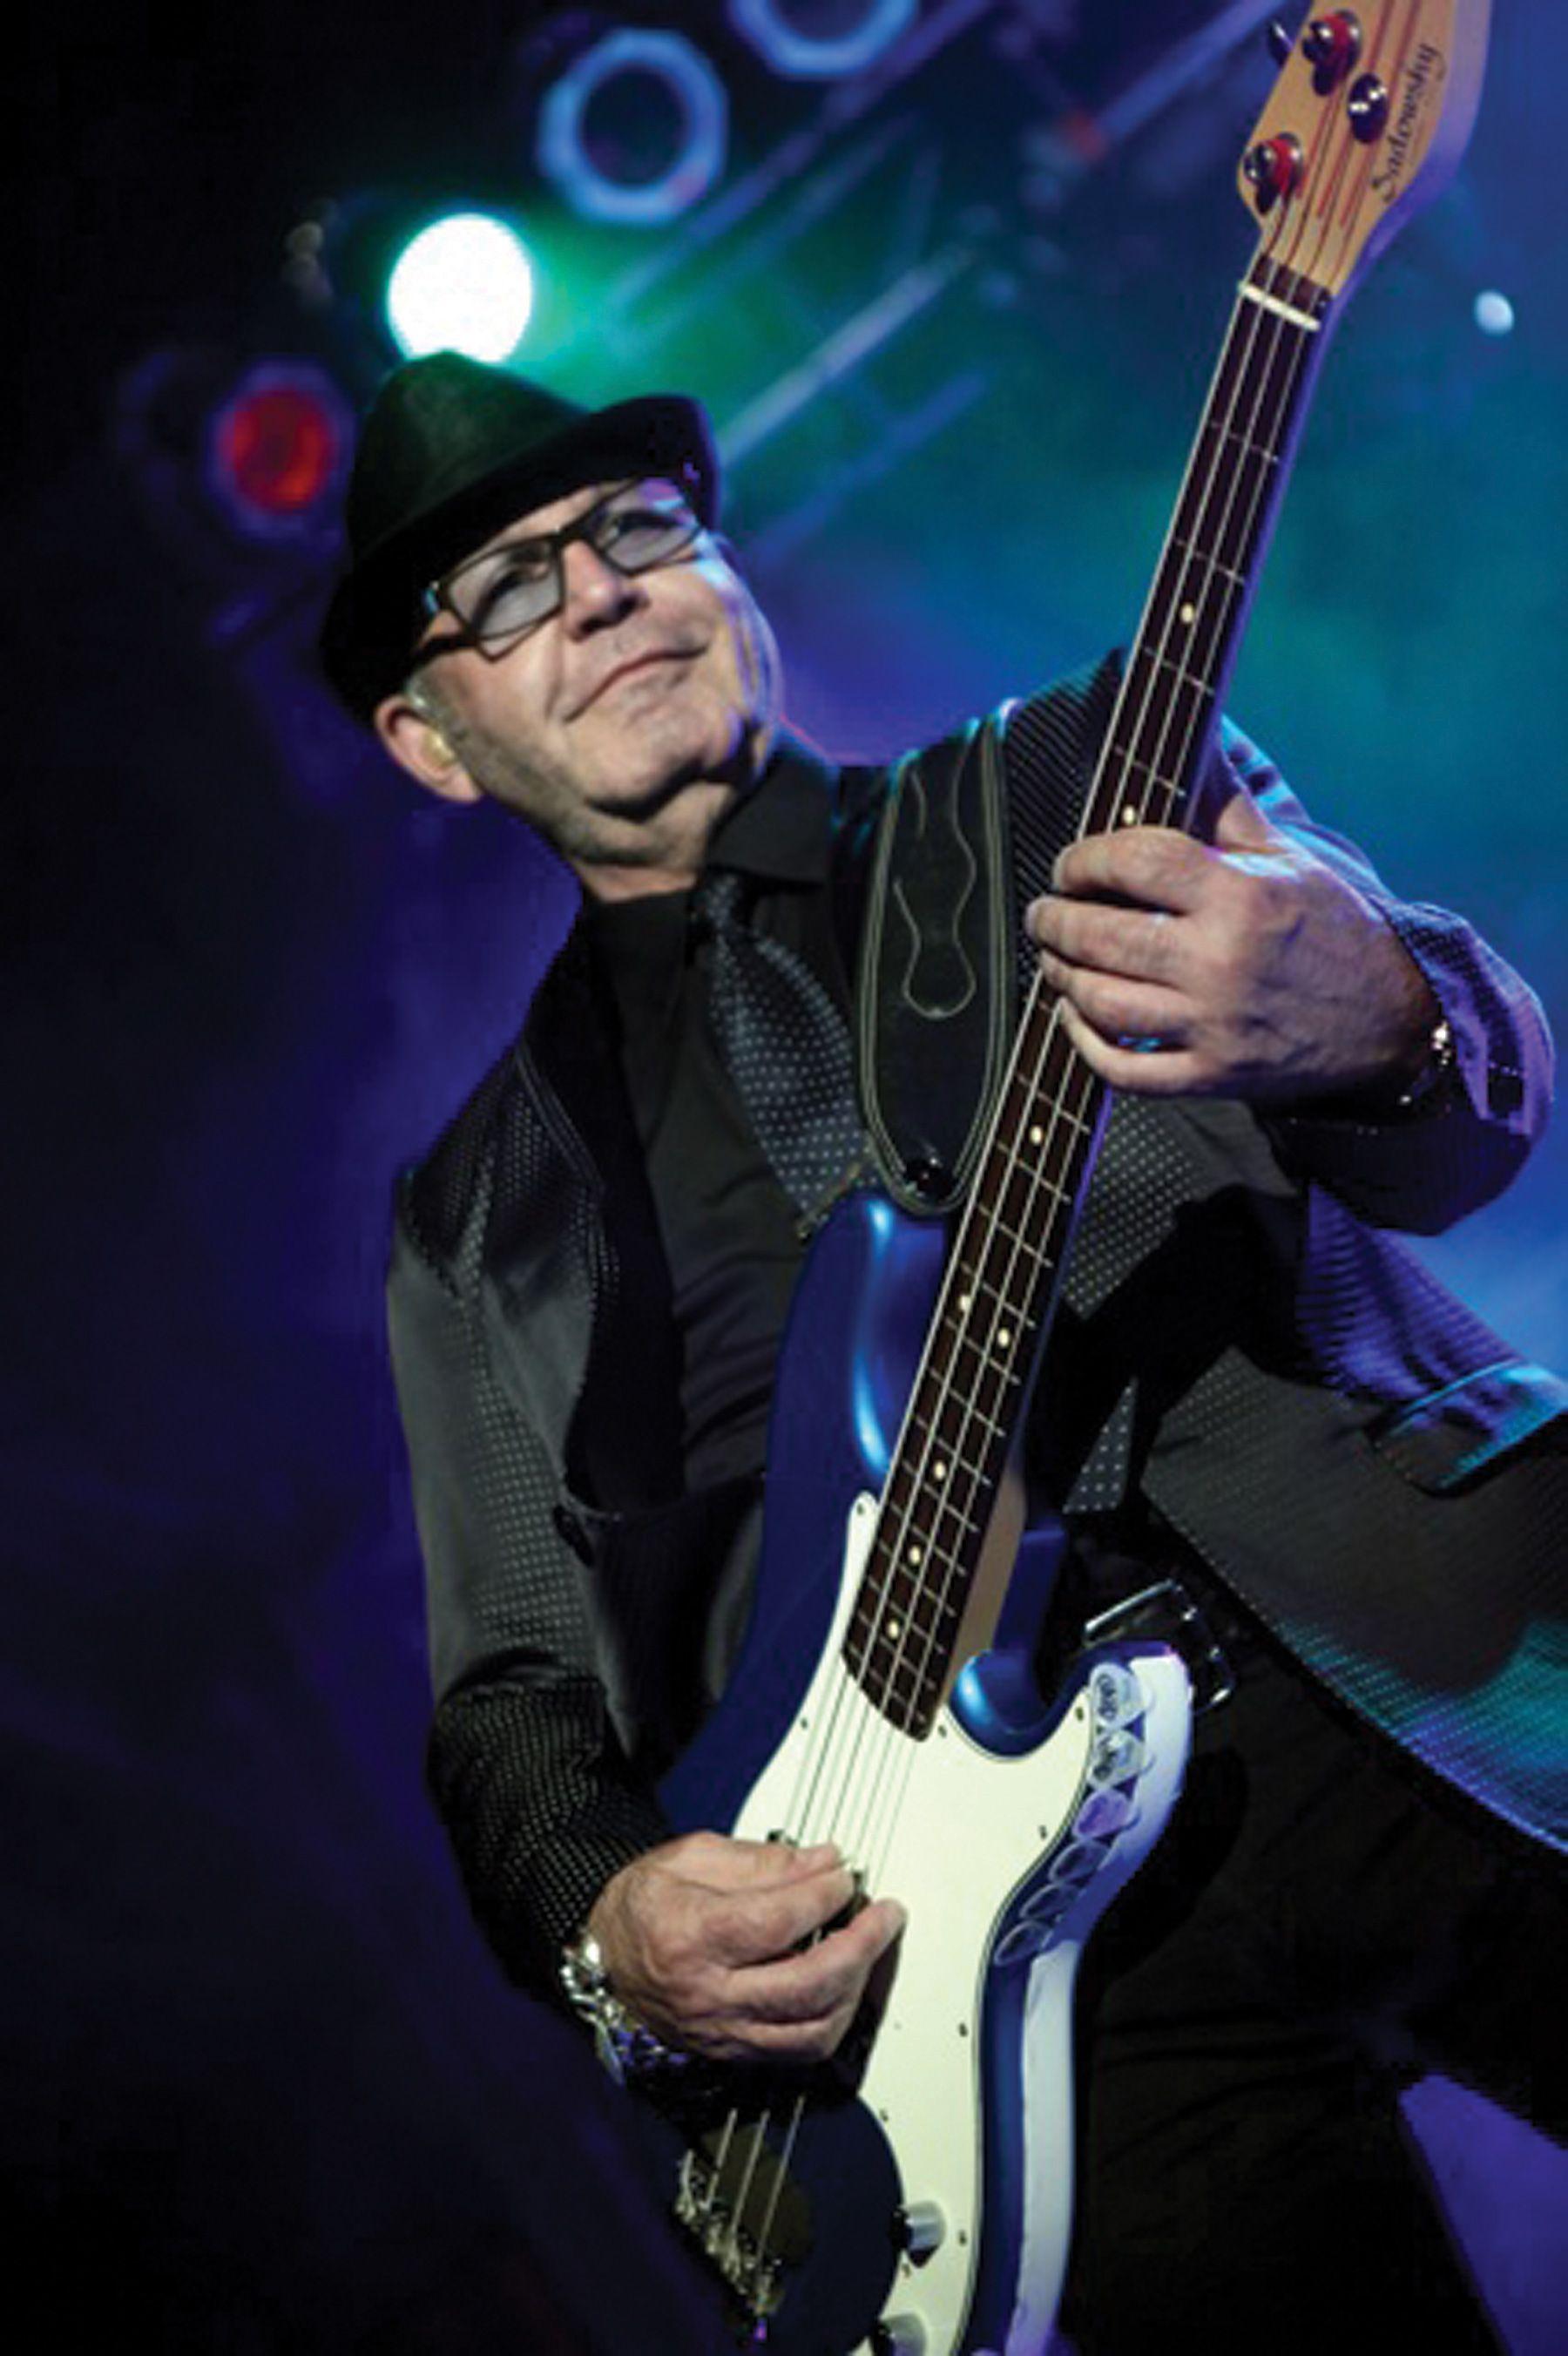 13. Chuck Panozzo